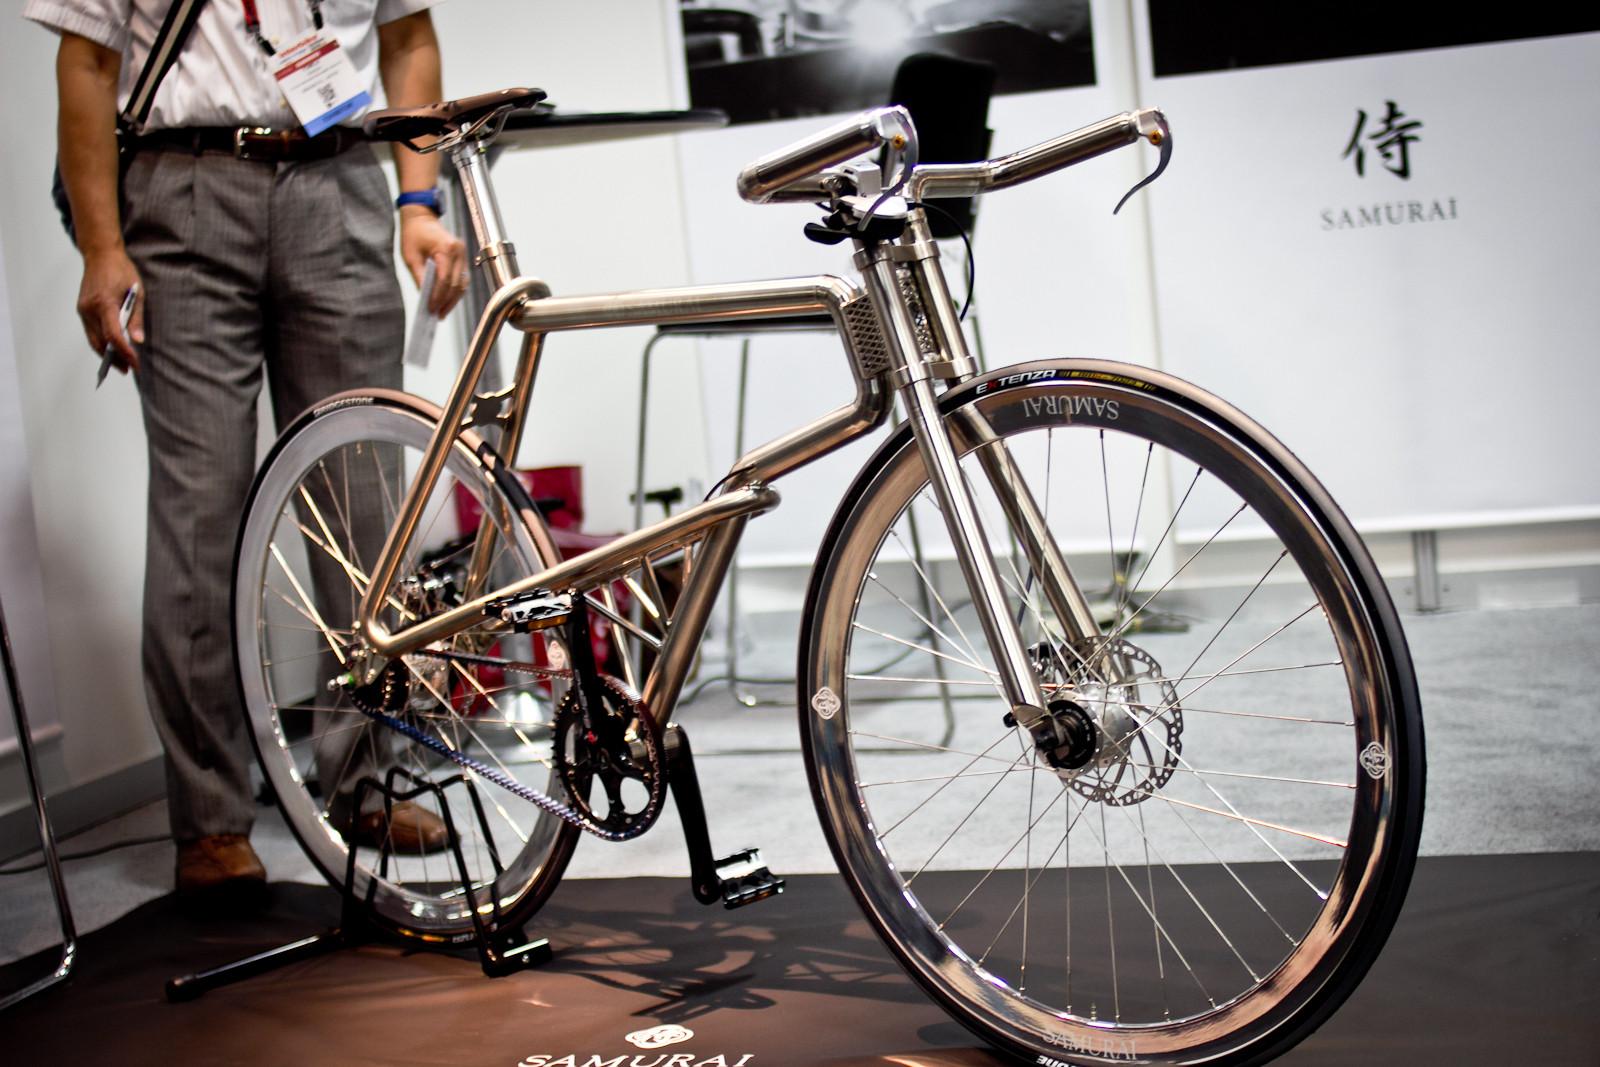 Titanium Samurai Bike - INTERBIKE Part 2: Some of the Latest and Greatest for 2015 - Mountain Biking Pictures - Vital MTB